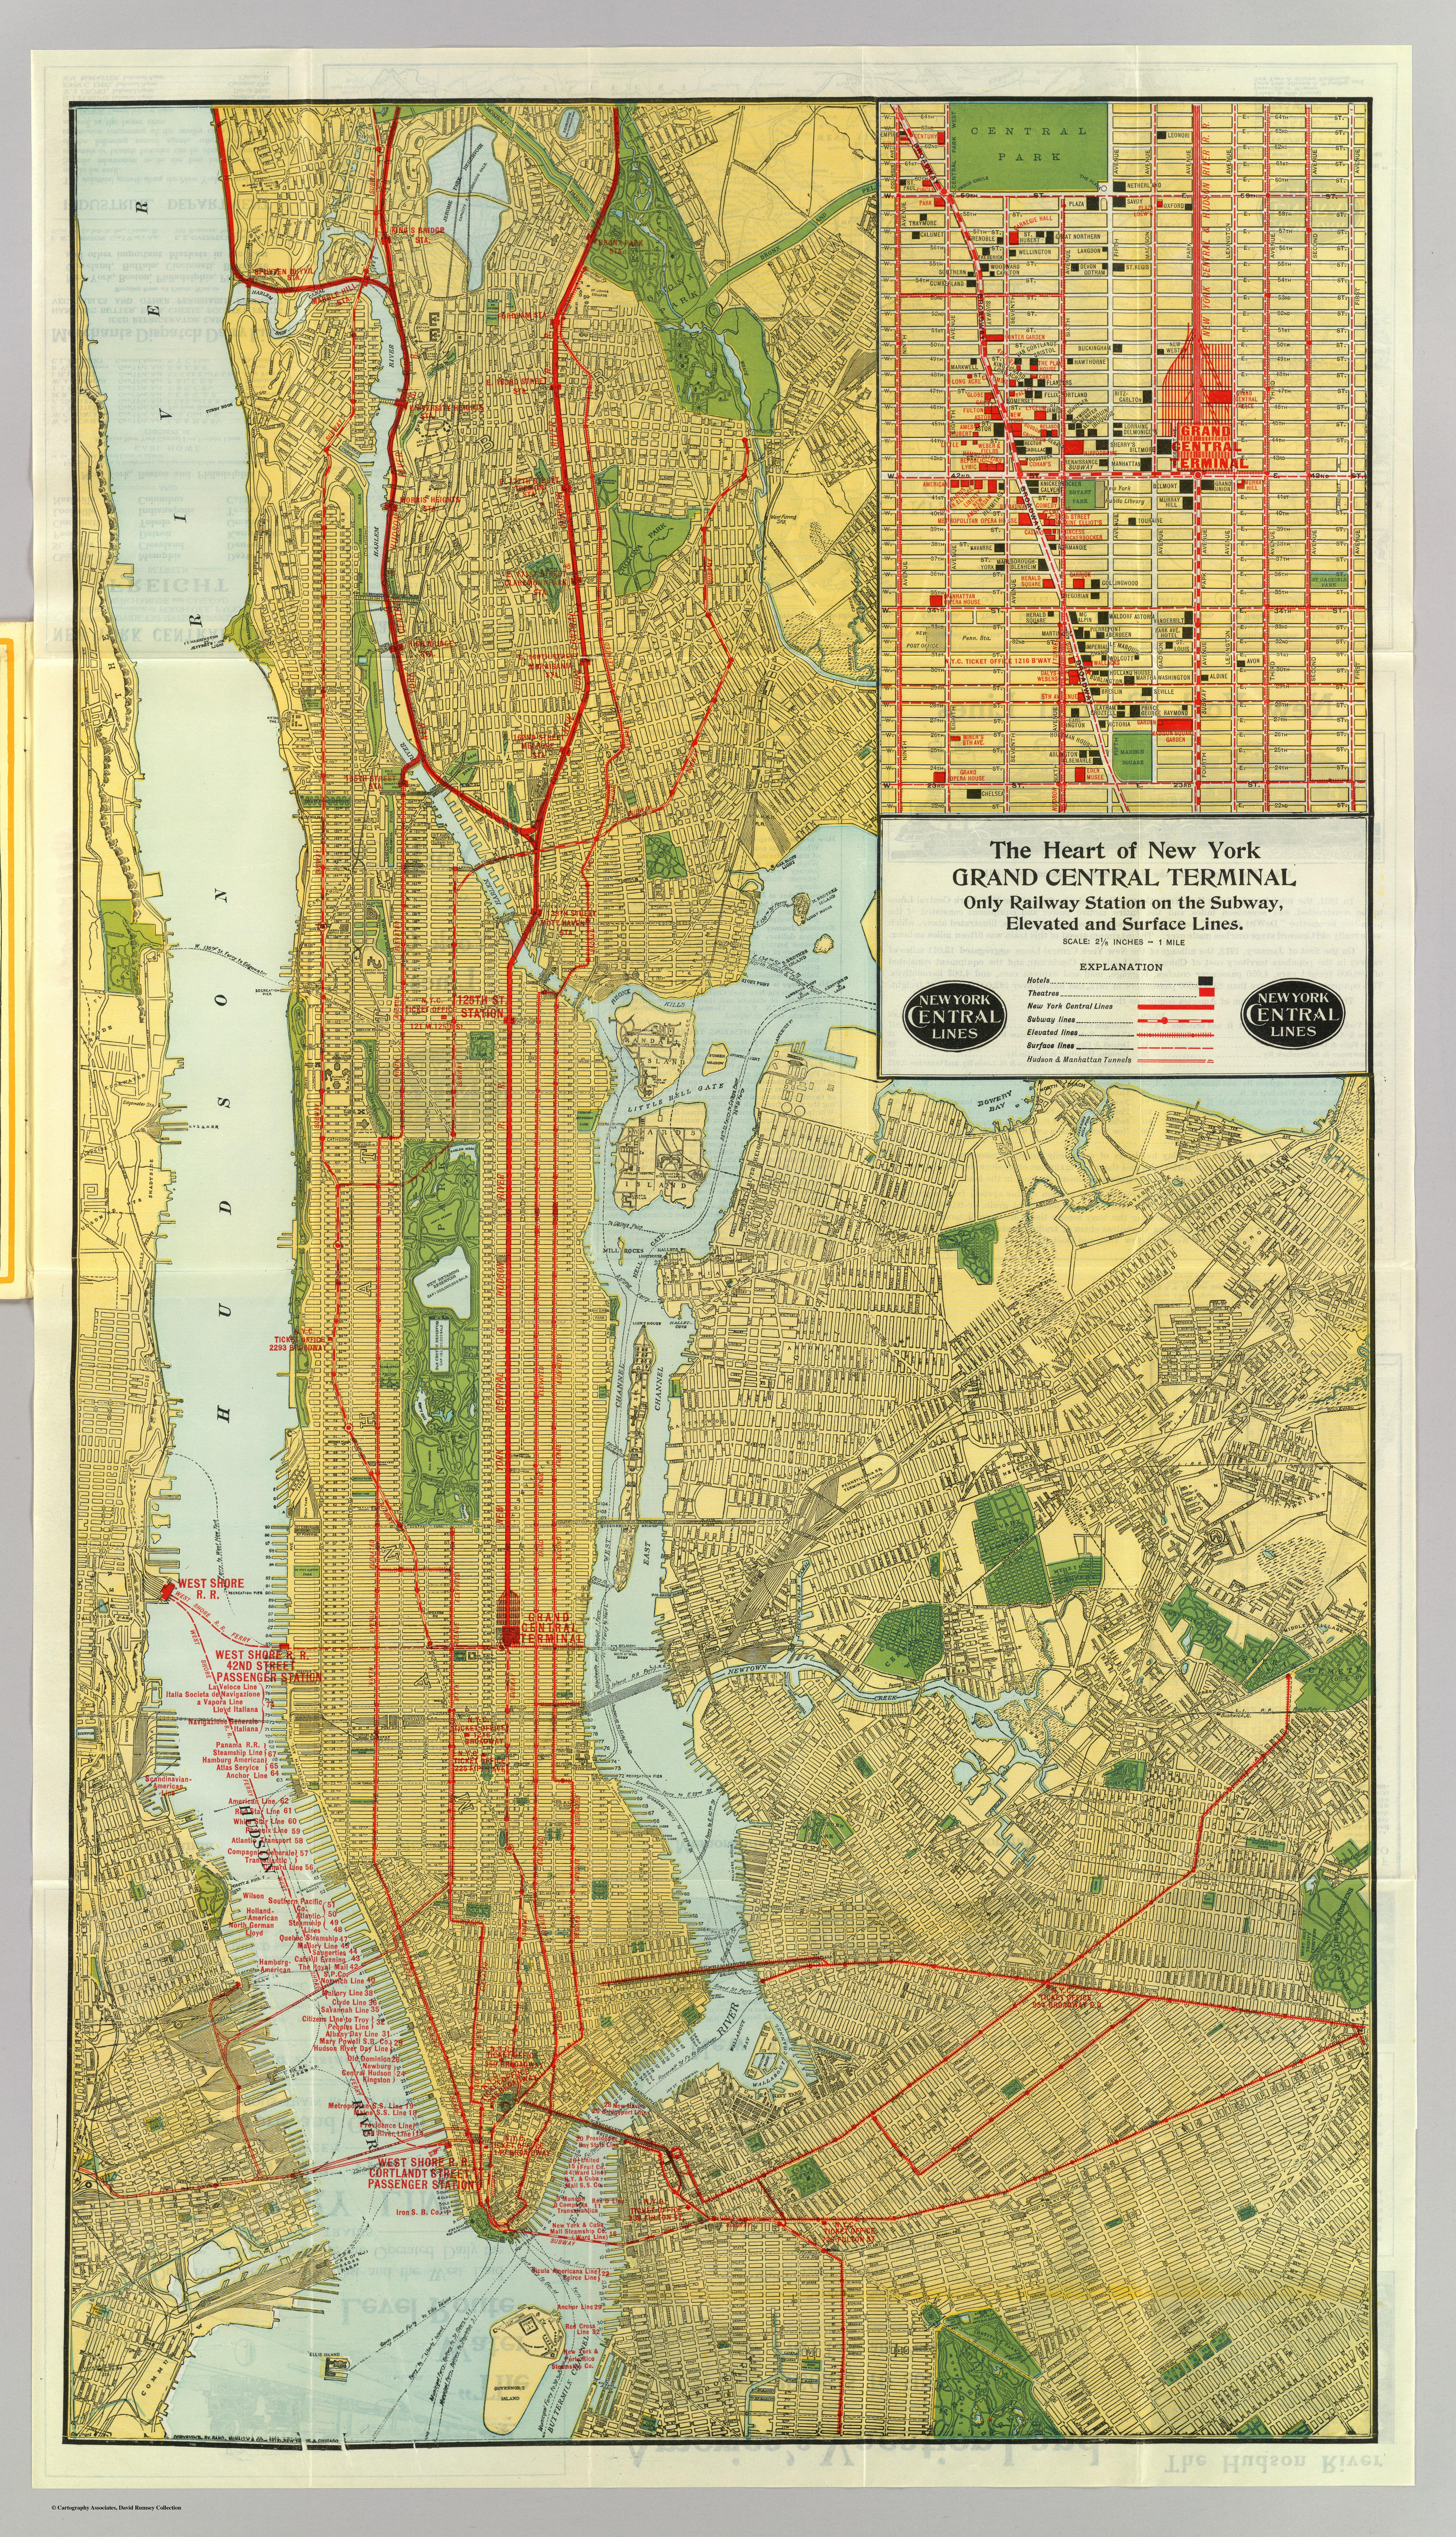 Map of NYC railroads 1918